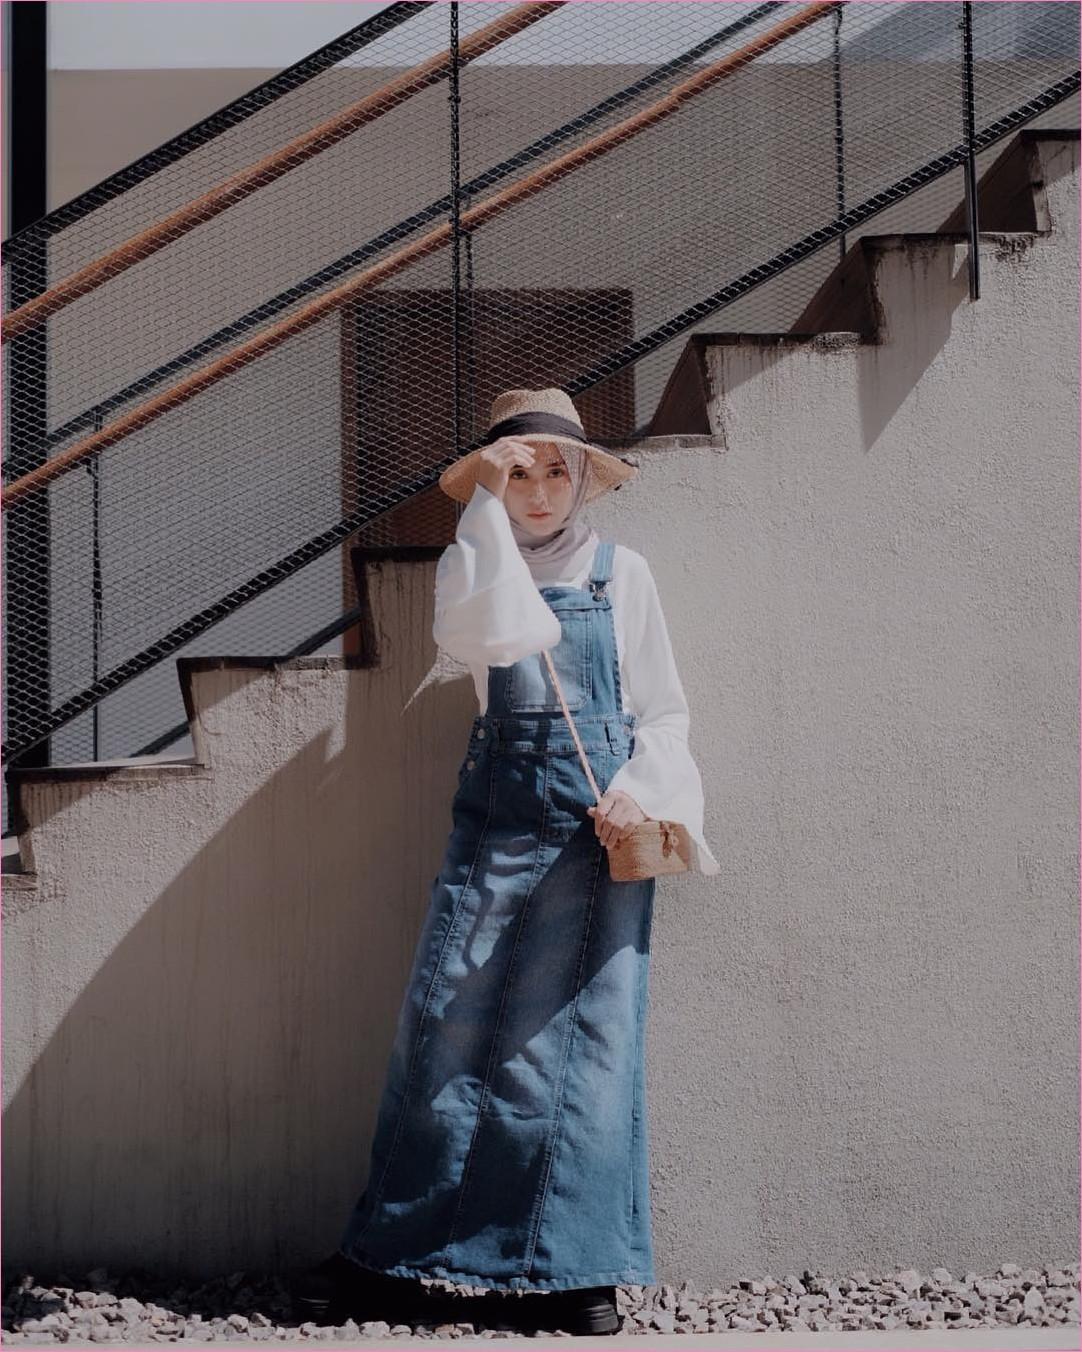 Outfit Baju Jumpsuit Berhijab Ala Selebgram 2018 jumpsuit rok jeans denim top blouse lengan terompet lebar putih hijab pashmina krem topi coklat sling bags rotan wedges sneakers heels hitam gaya casual kain sutra katun ootd outfit 2018 tangga selebgram batu kerikil abu